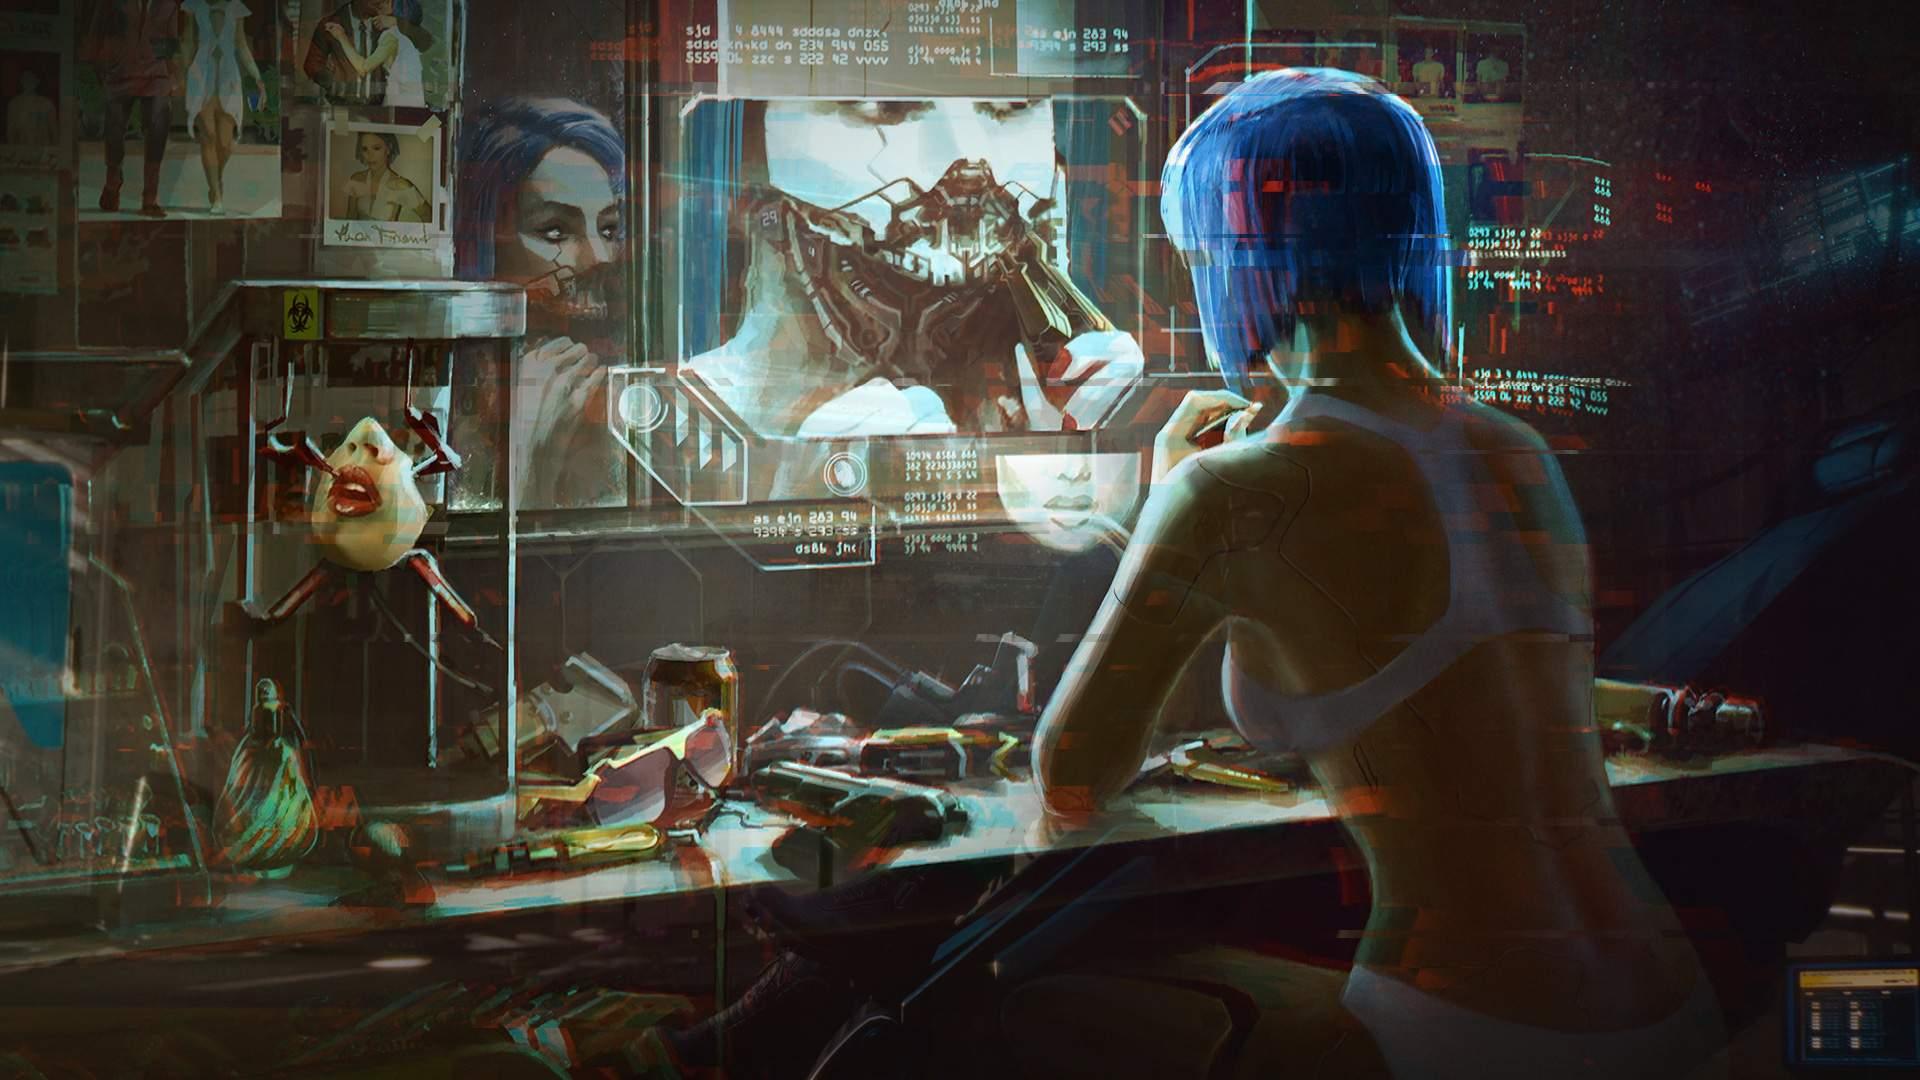 lumea cyberpunk